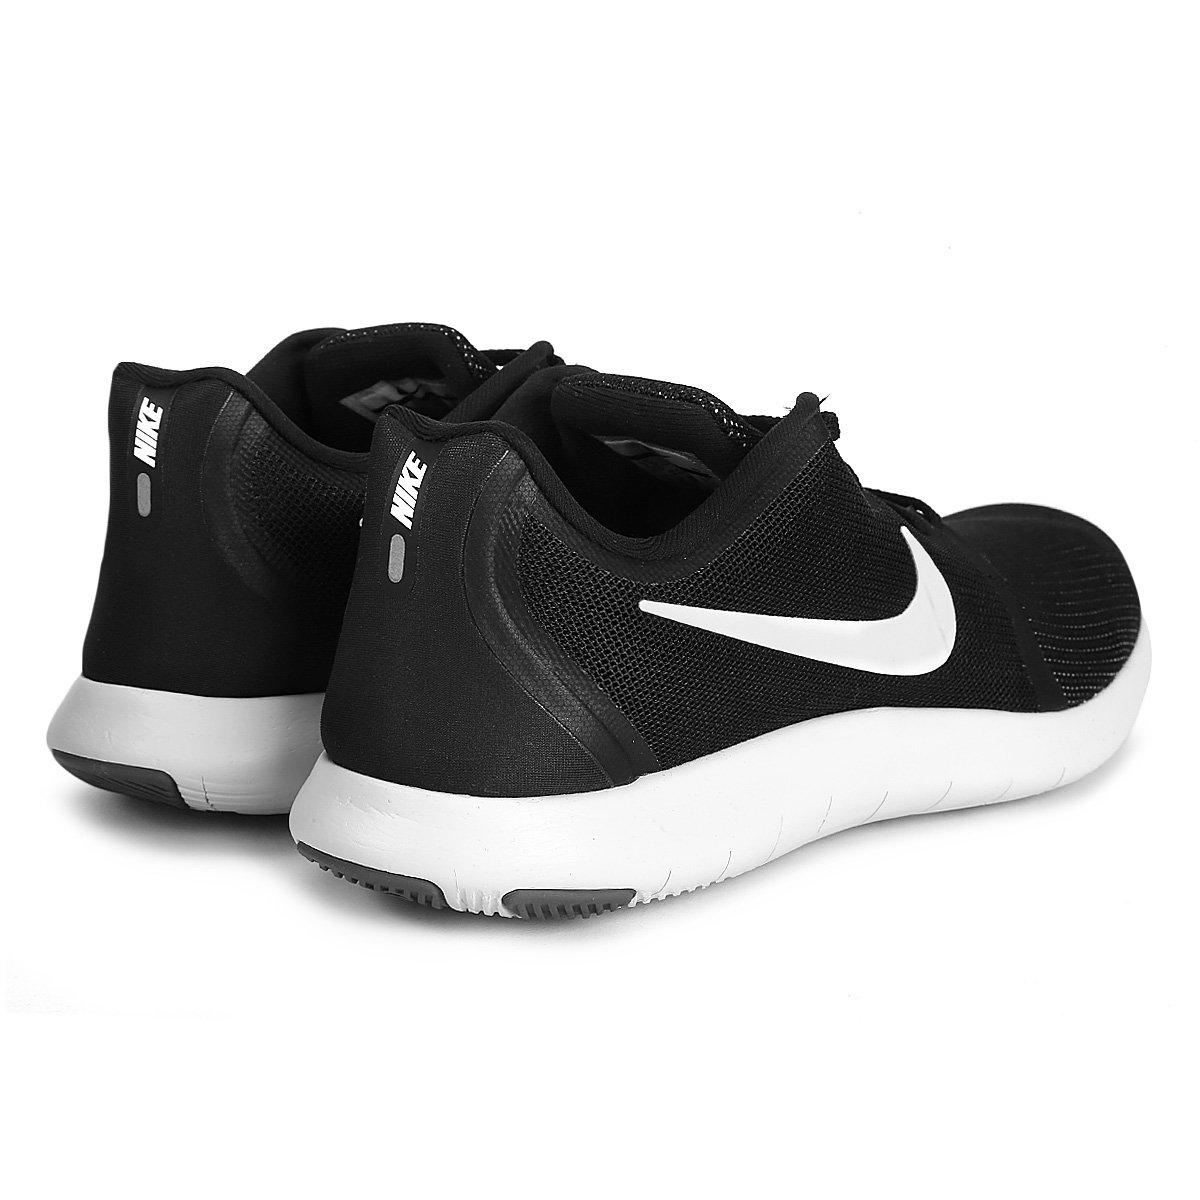 b09c55511 Tênis Nike Flex Contact 2 Masculino - Preto e Branco - Compre Agora ...